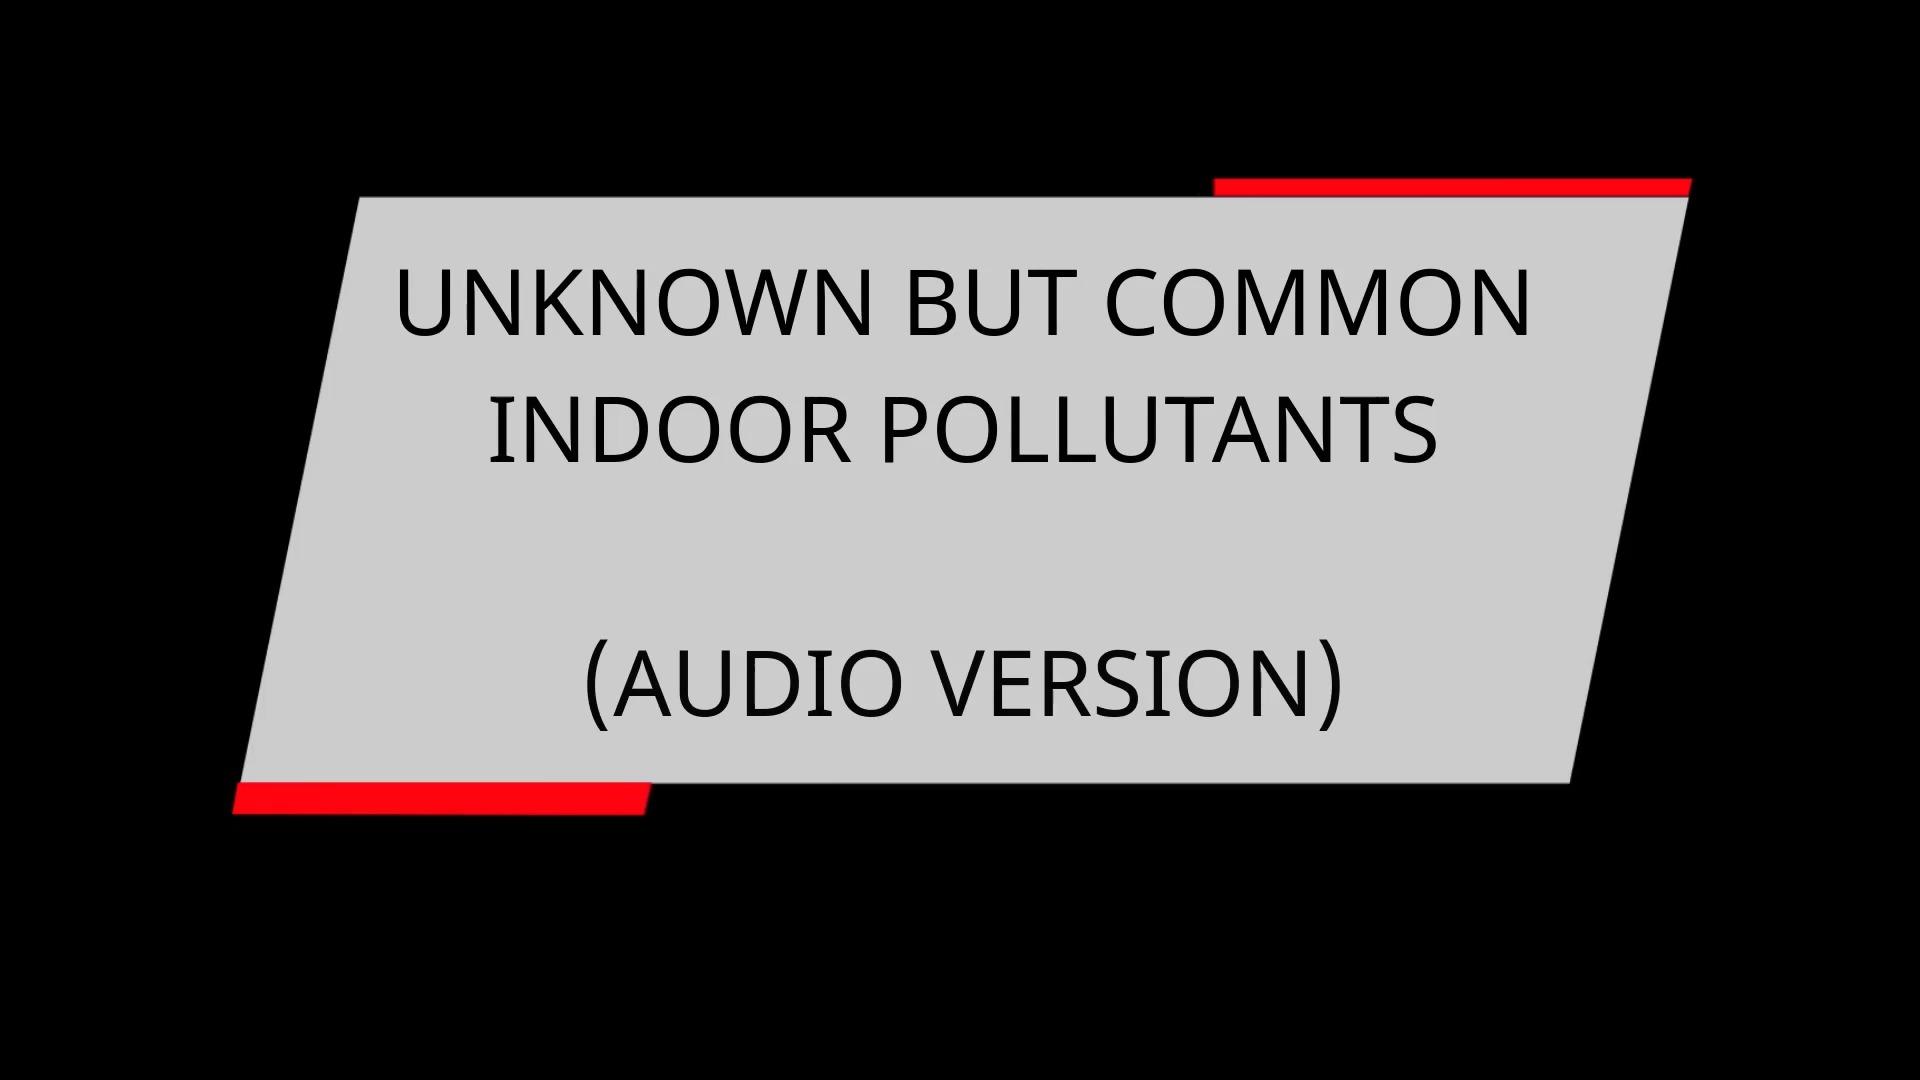 UNKNOWN BUT COMMON INDOOR POLLUTANTS